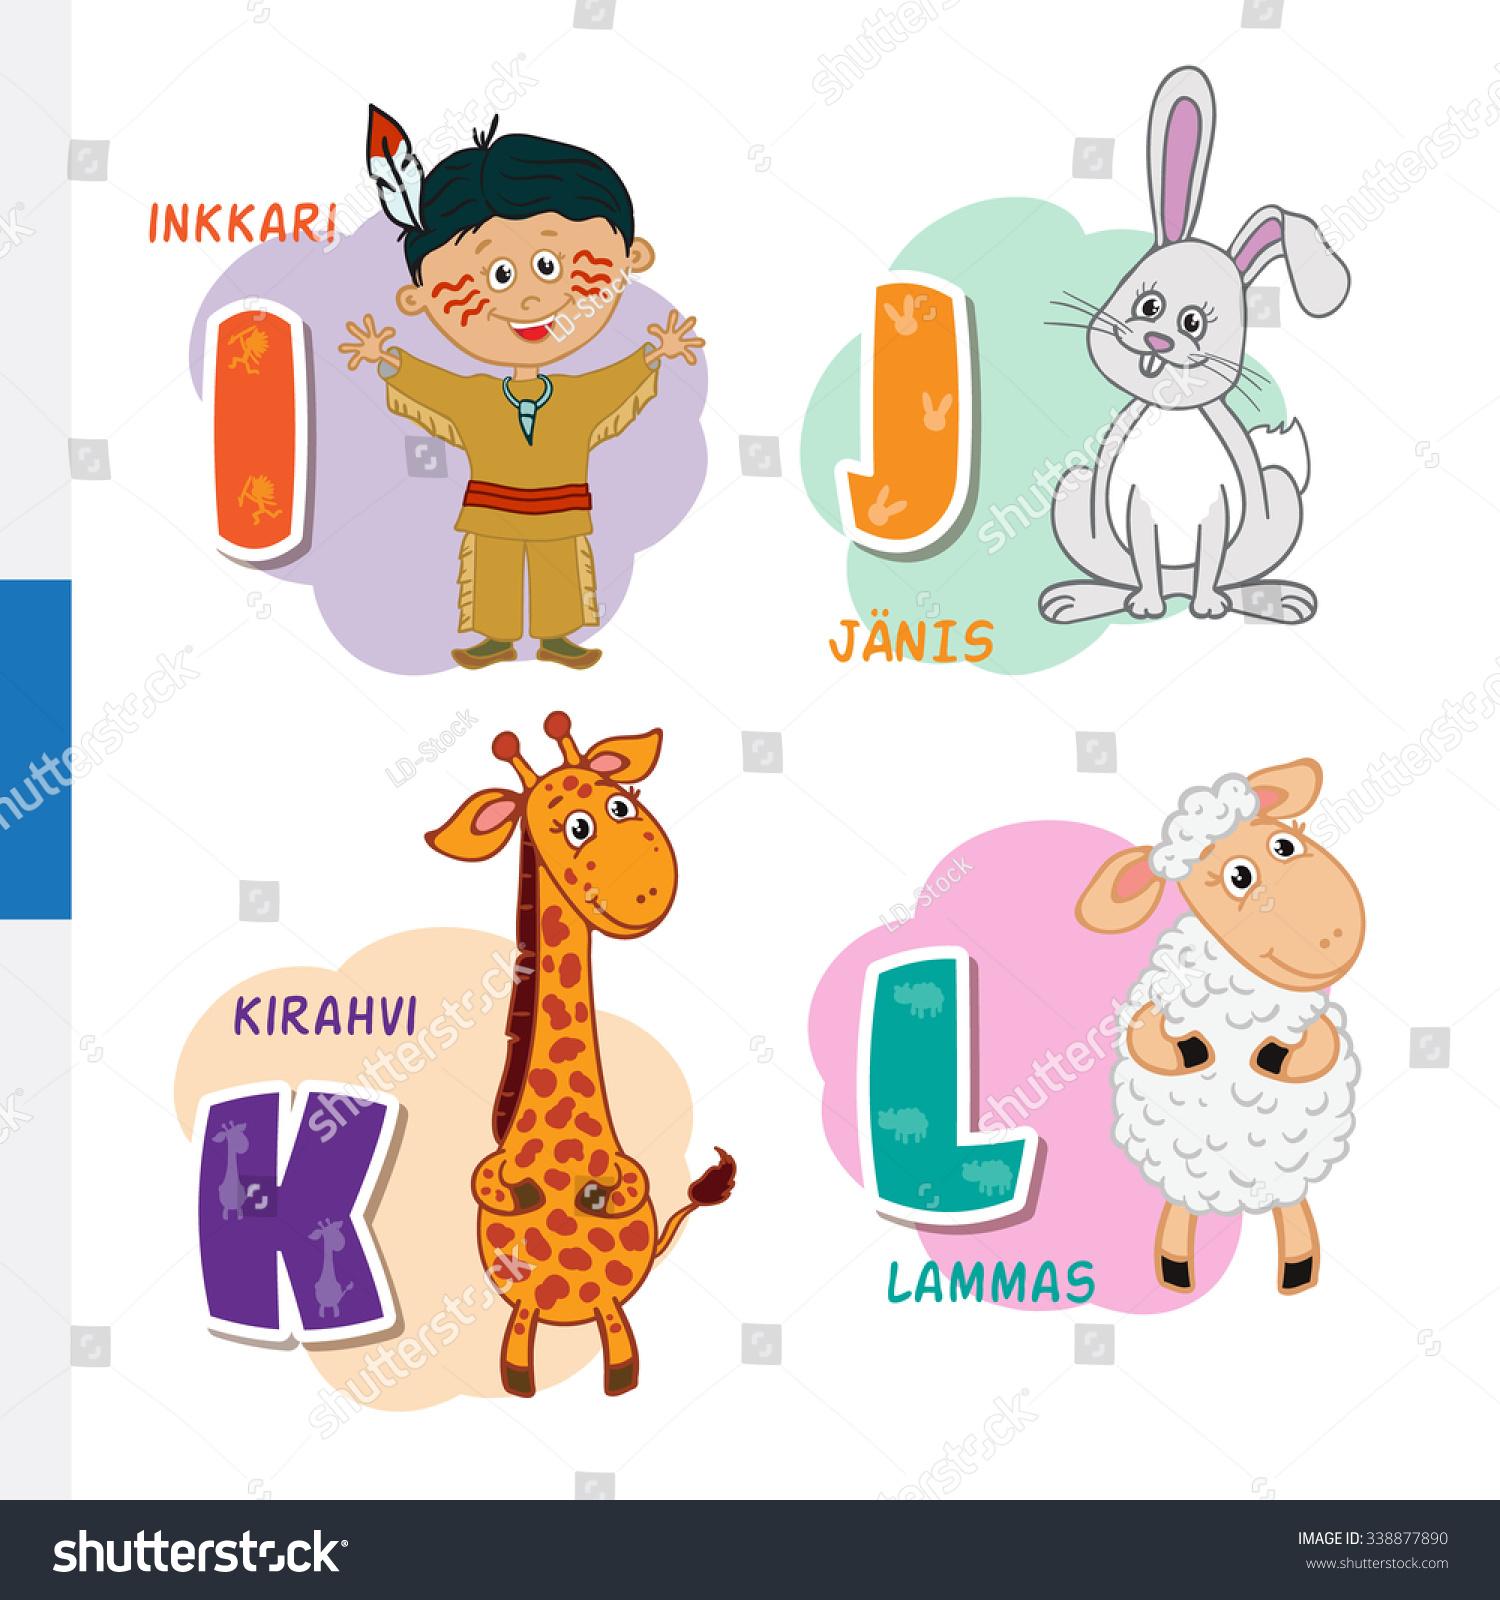 Finnish Alphabet Native American Rabbit Giraffe Stock Illustration